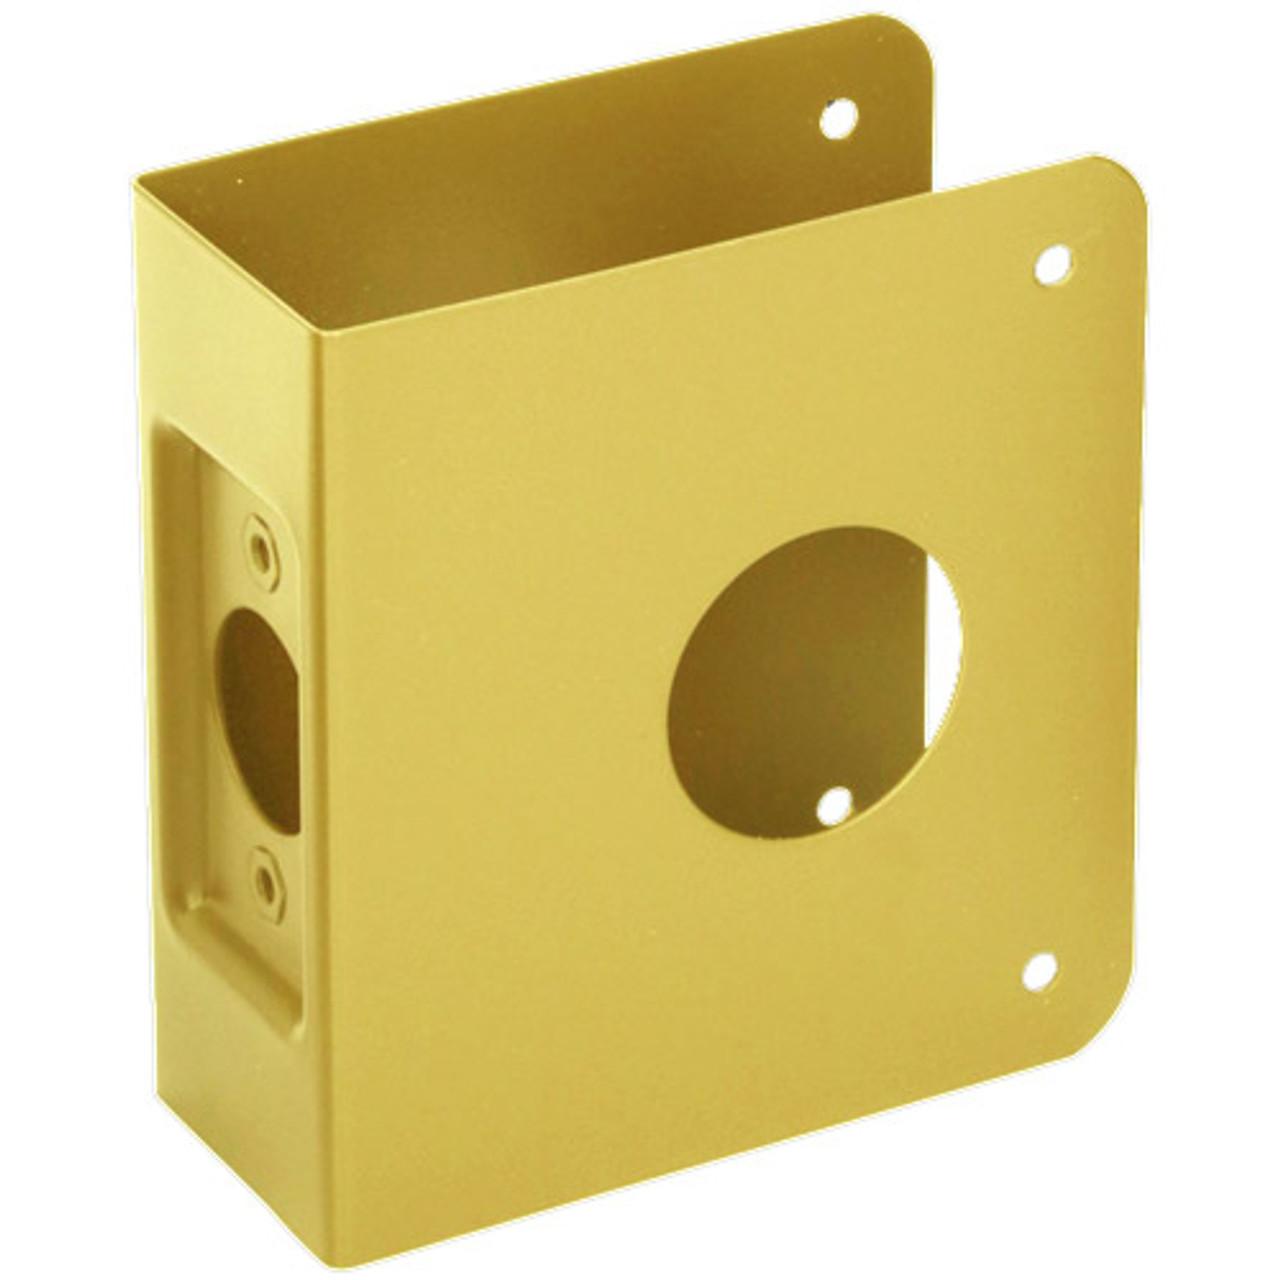 5-PB-CW Don Jo Classic Wrap Around Plate in Polished Brass Finish